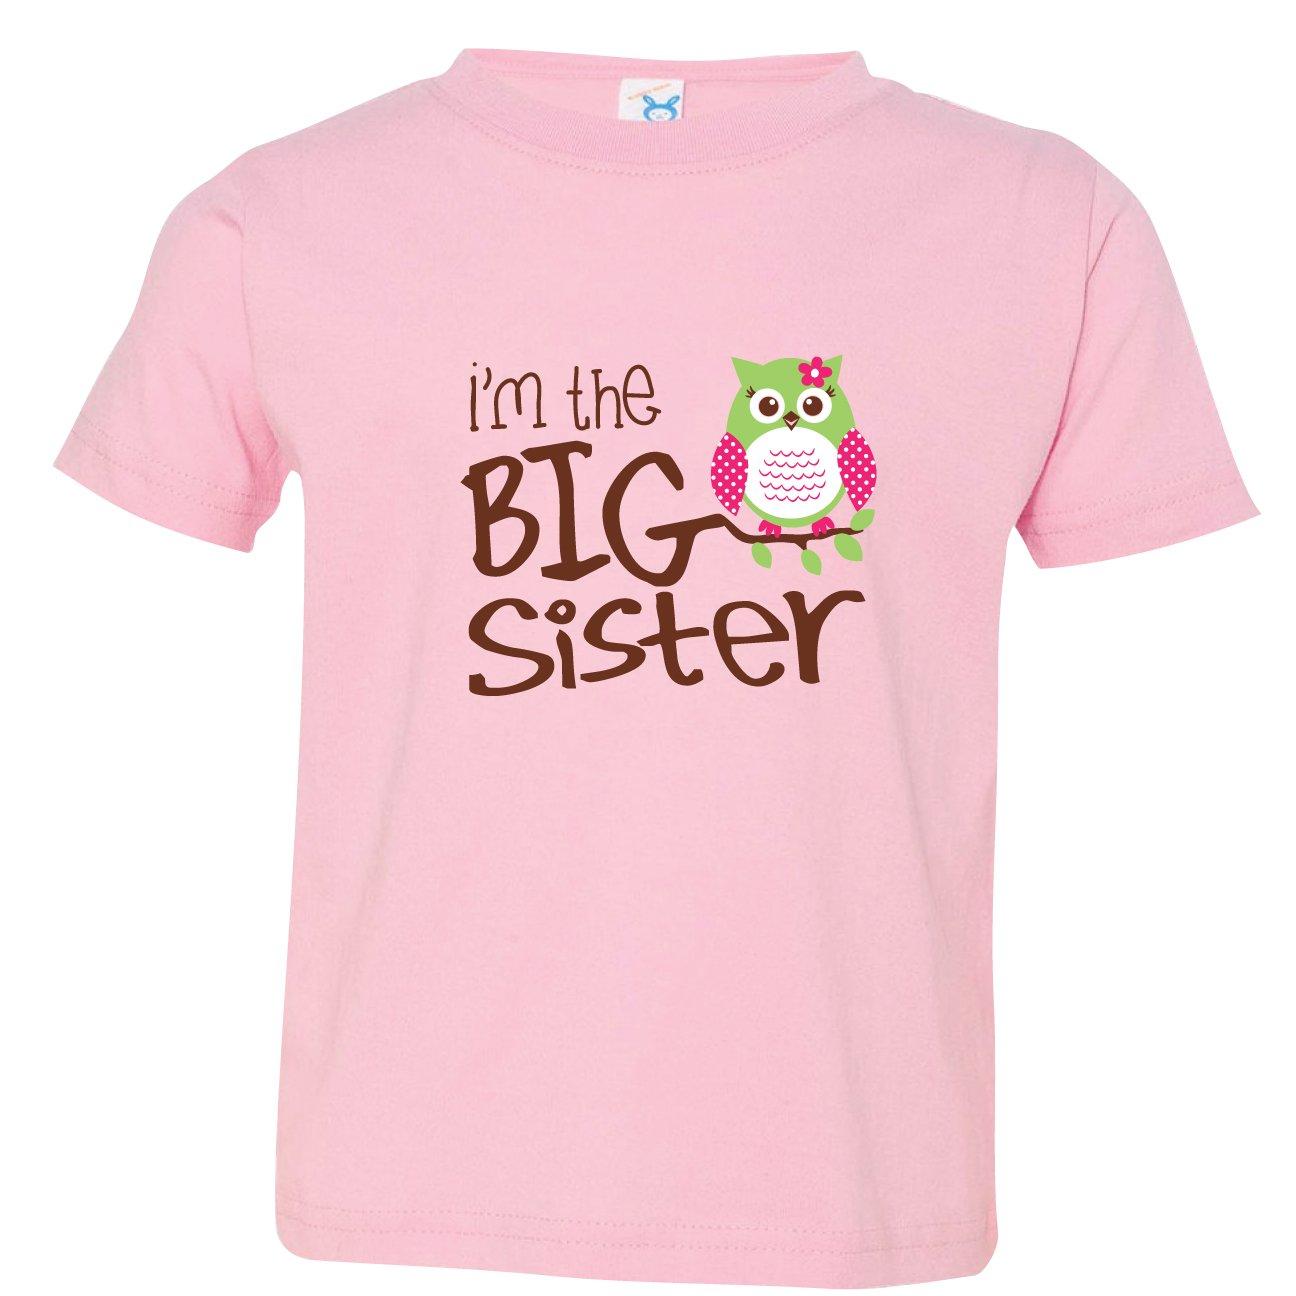 Nursery Decals and More SHIRT ベビーガールズ 3 Owl, I'm the Big Sister B00VKQPKPI